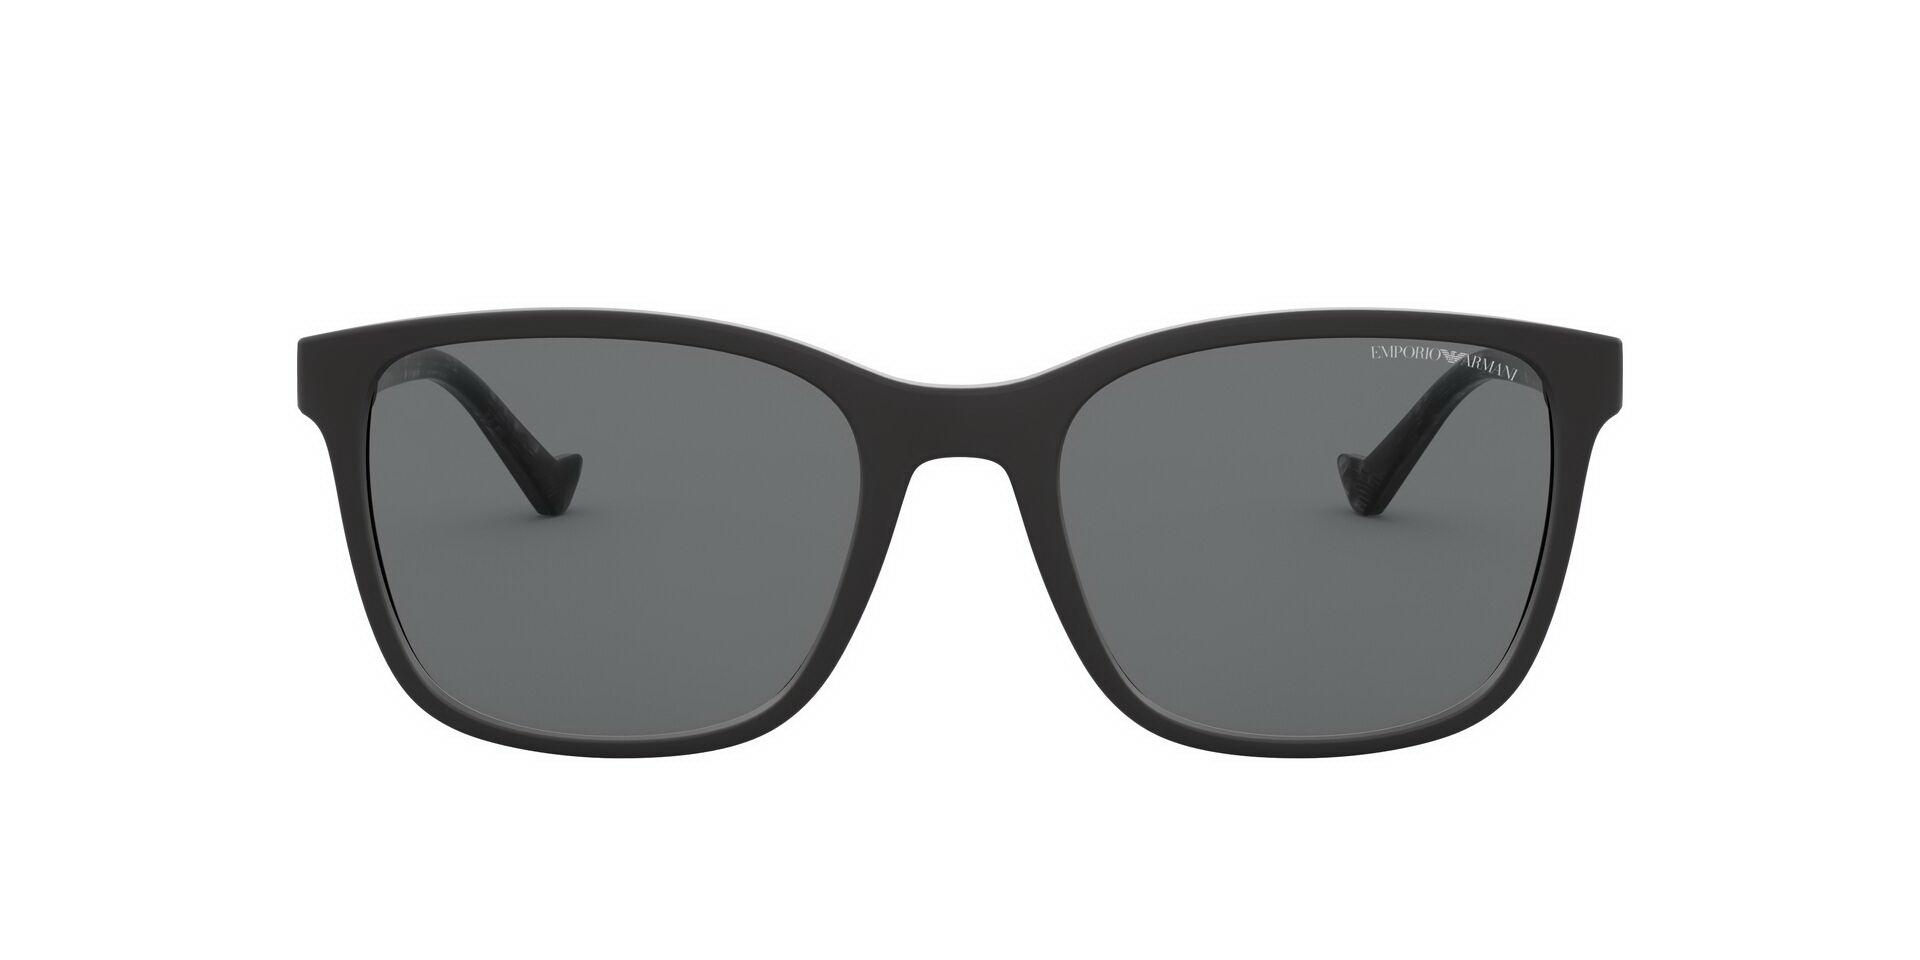 Солнцезащитные очки Очки с/з Emporio Armani 0EA4139 501781